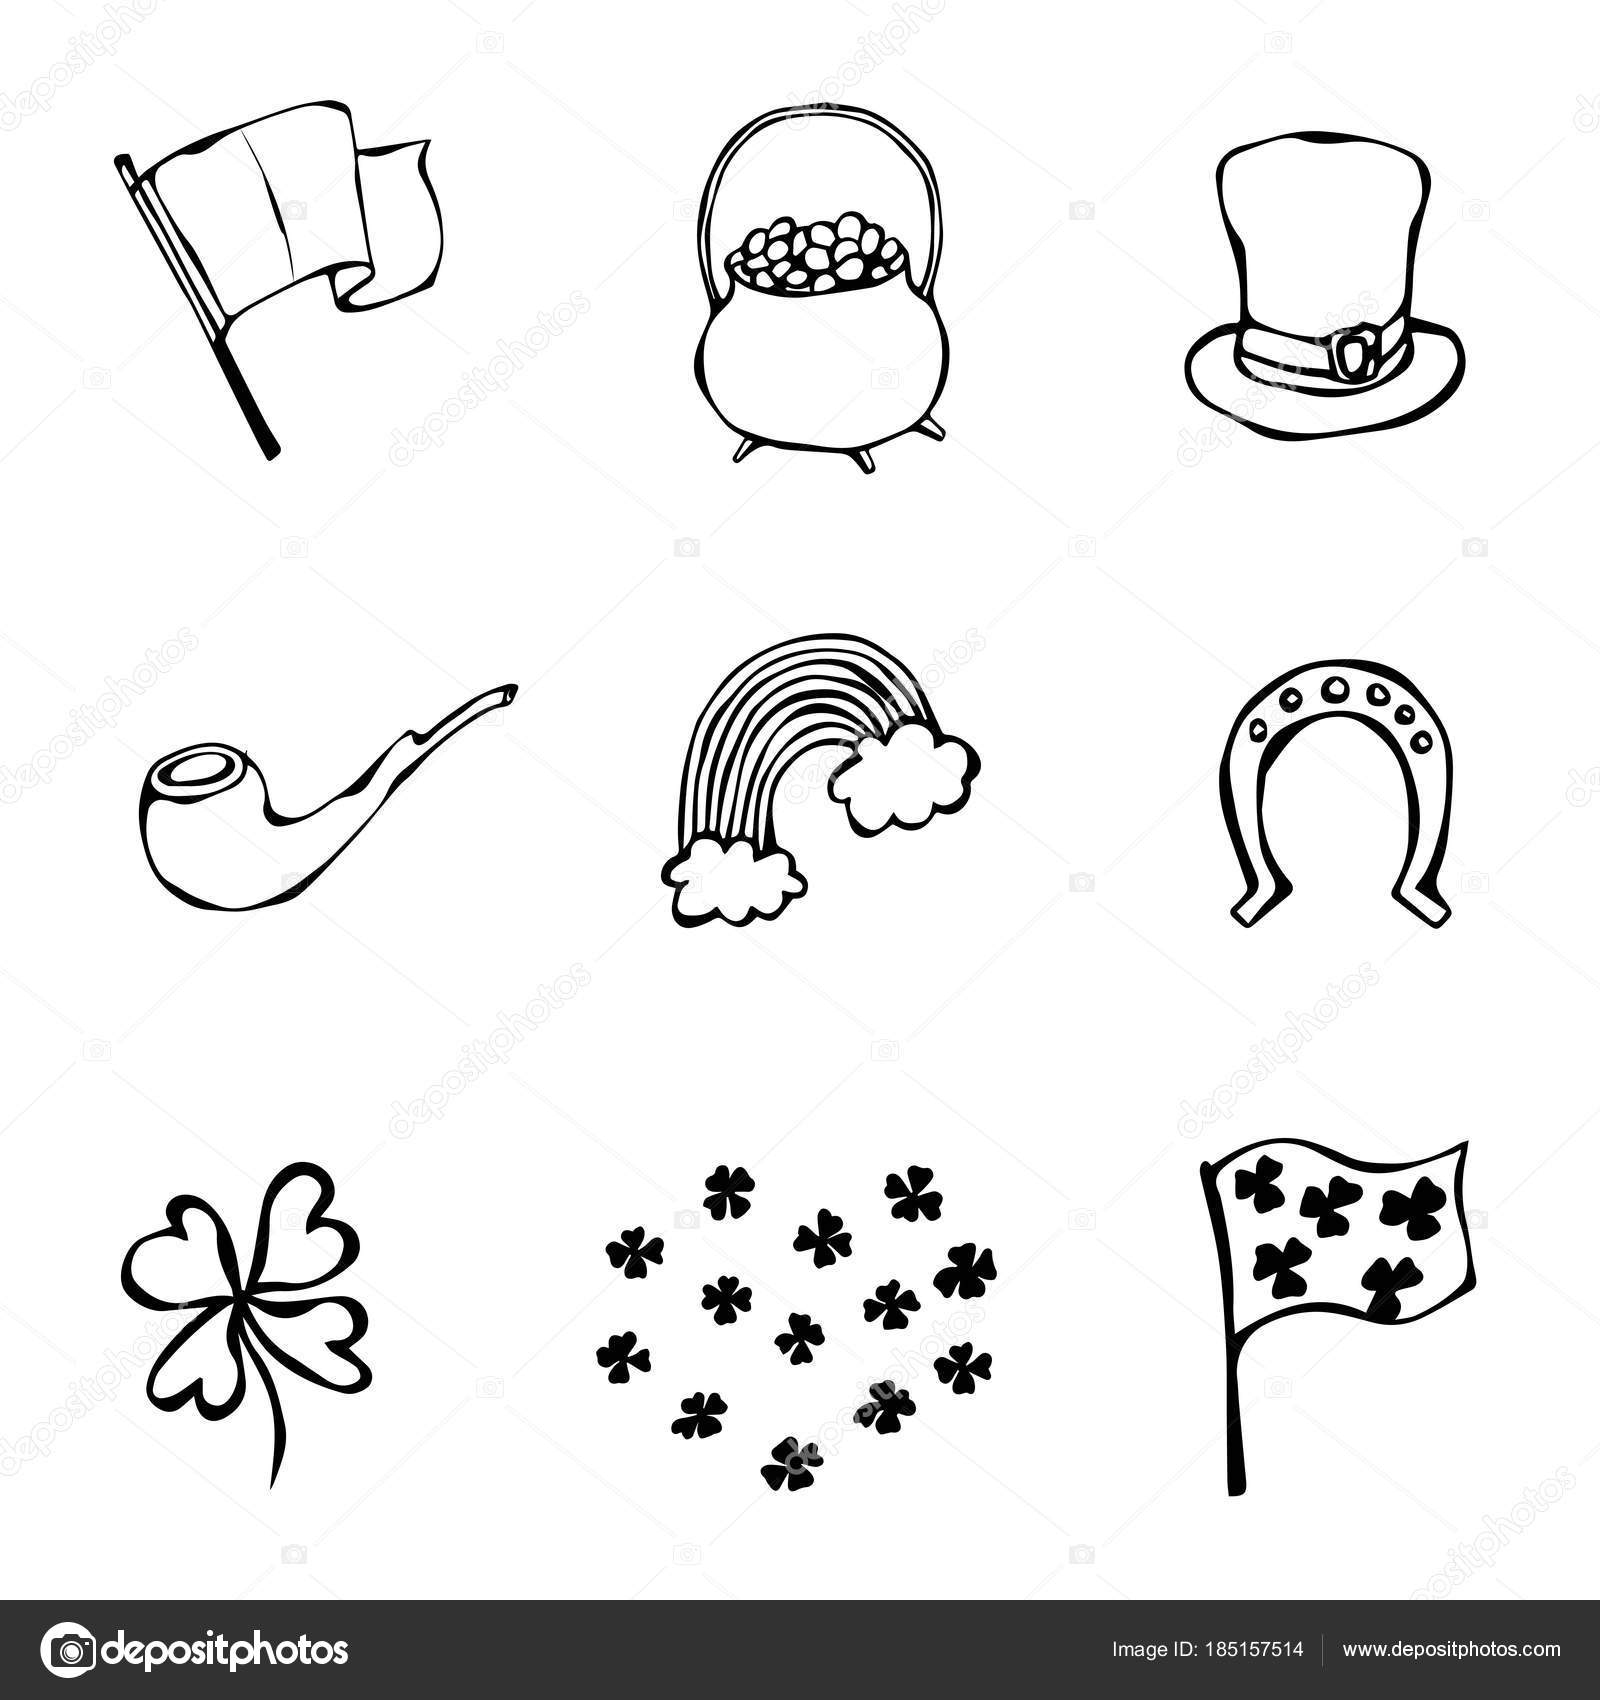 Collection Of Irish Symbols Leprechauns Hat Horseshoe Pot Of Gold Flag Beer Mug Rainbow Clover St Patrick Day Savoyar Doodle Style Stock Photo C Leen Savoyar Com 185157514